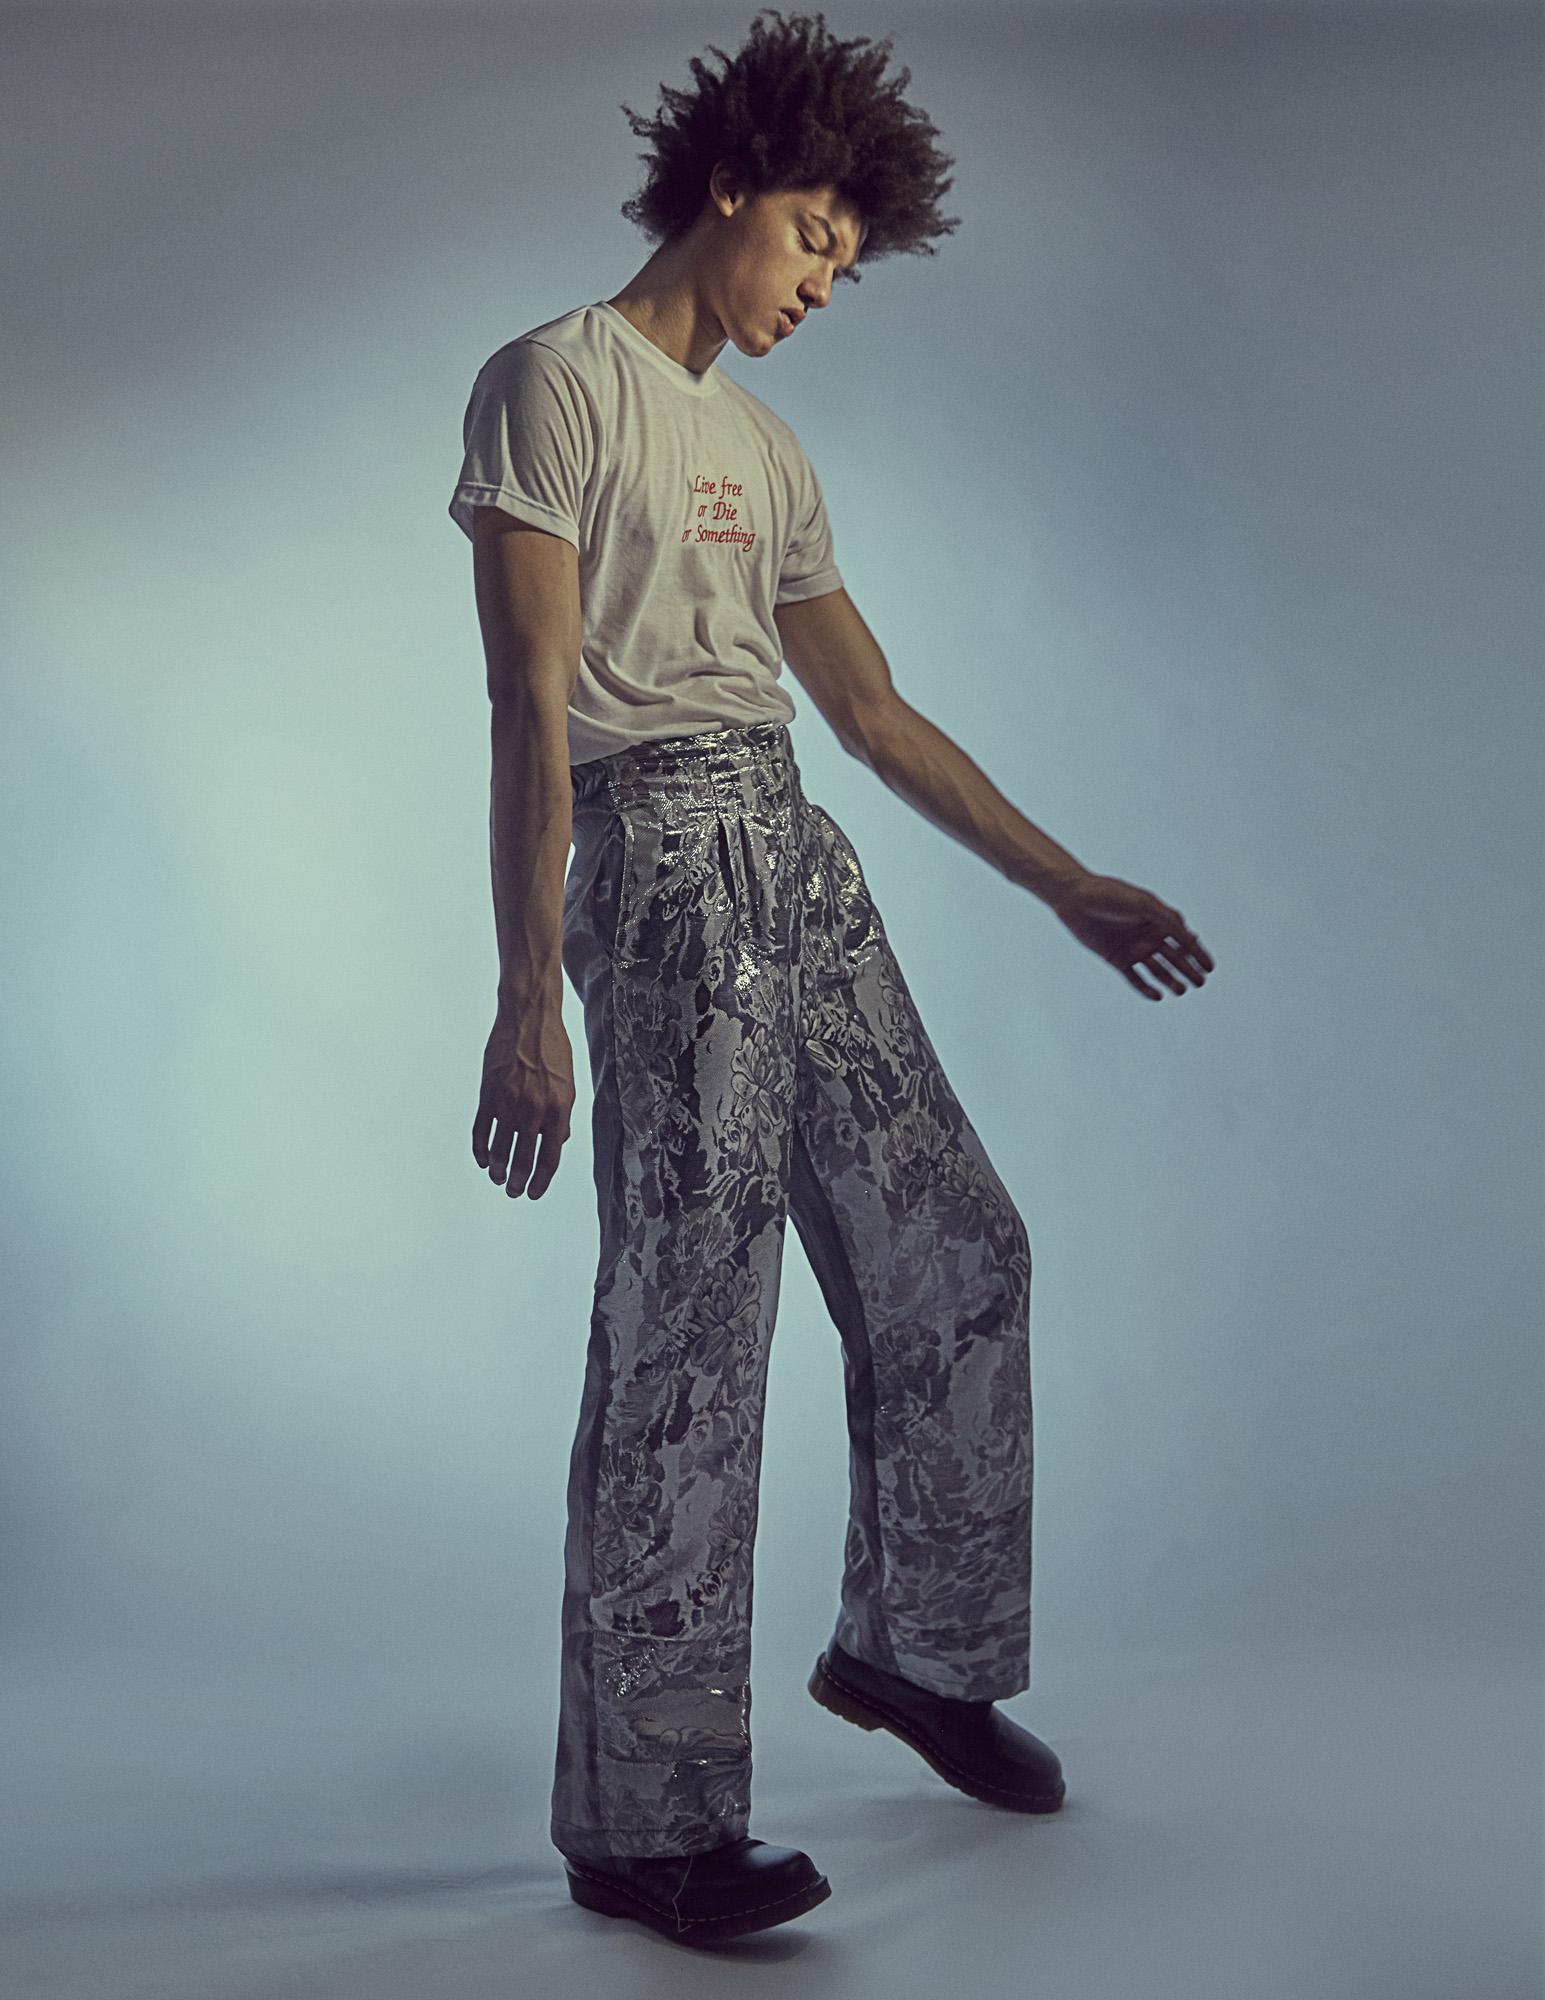 Gabriel Gomieri by Thee Tham Vanity Teen Menswear Magazine